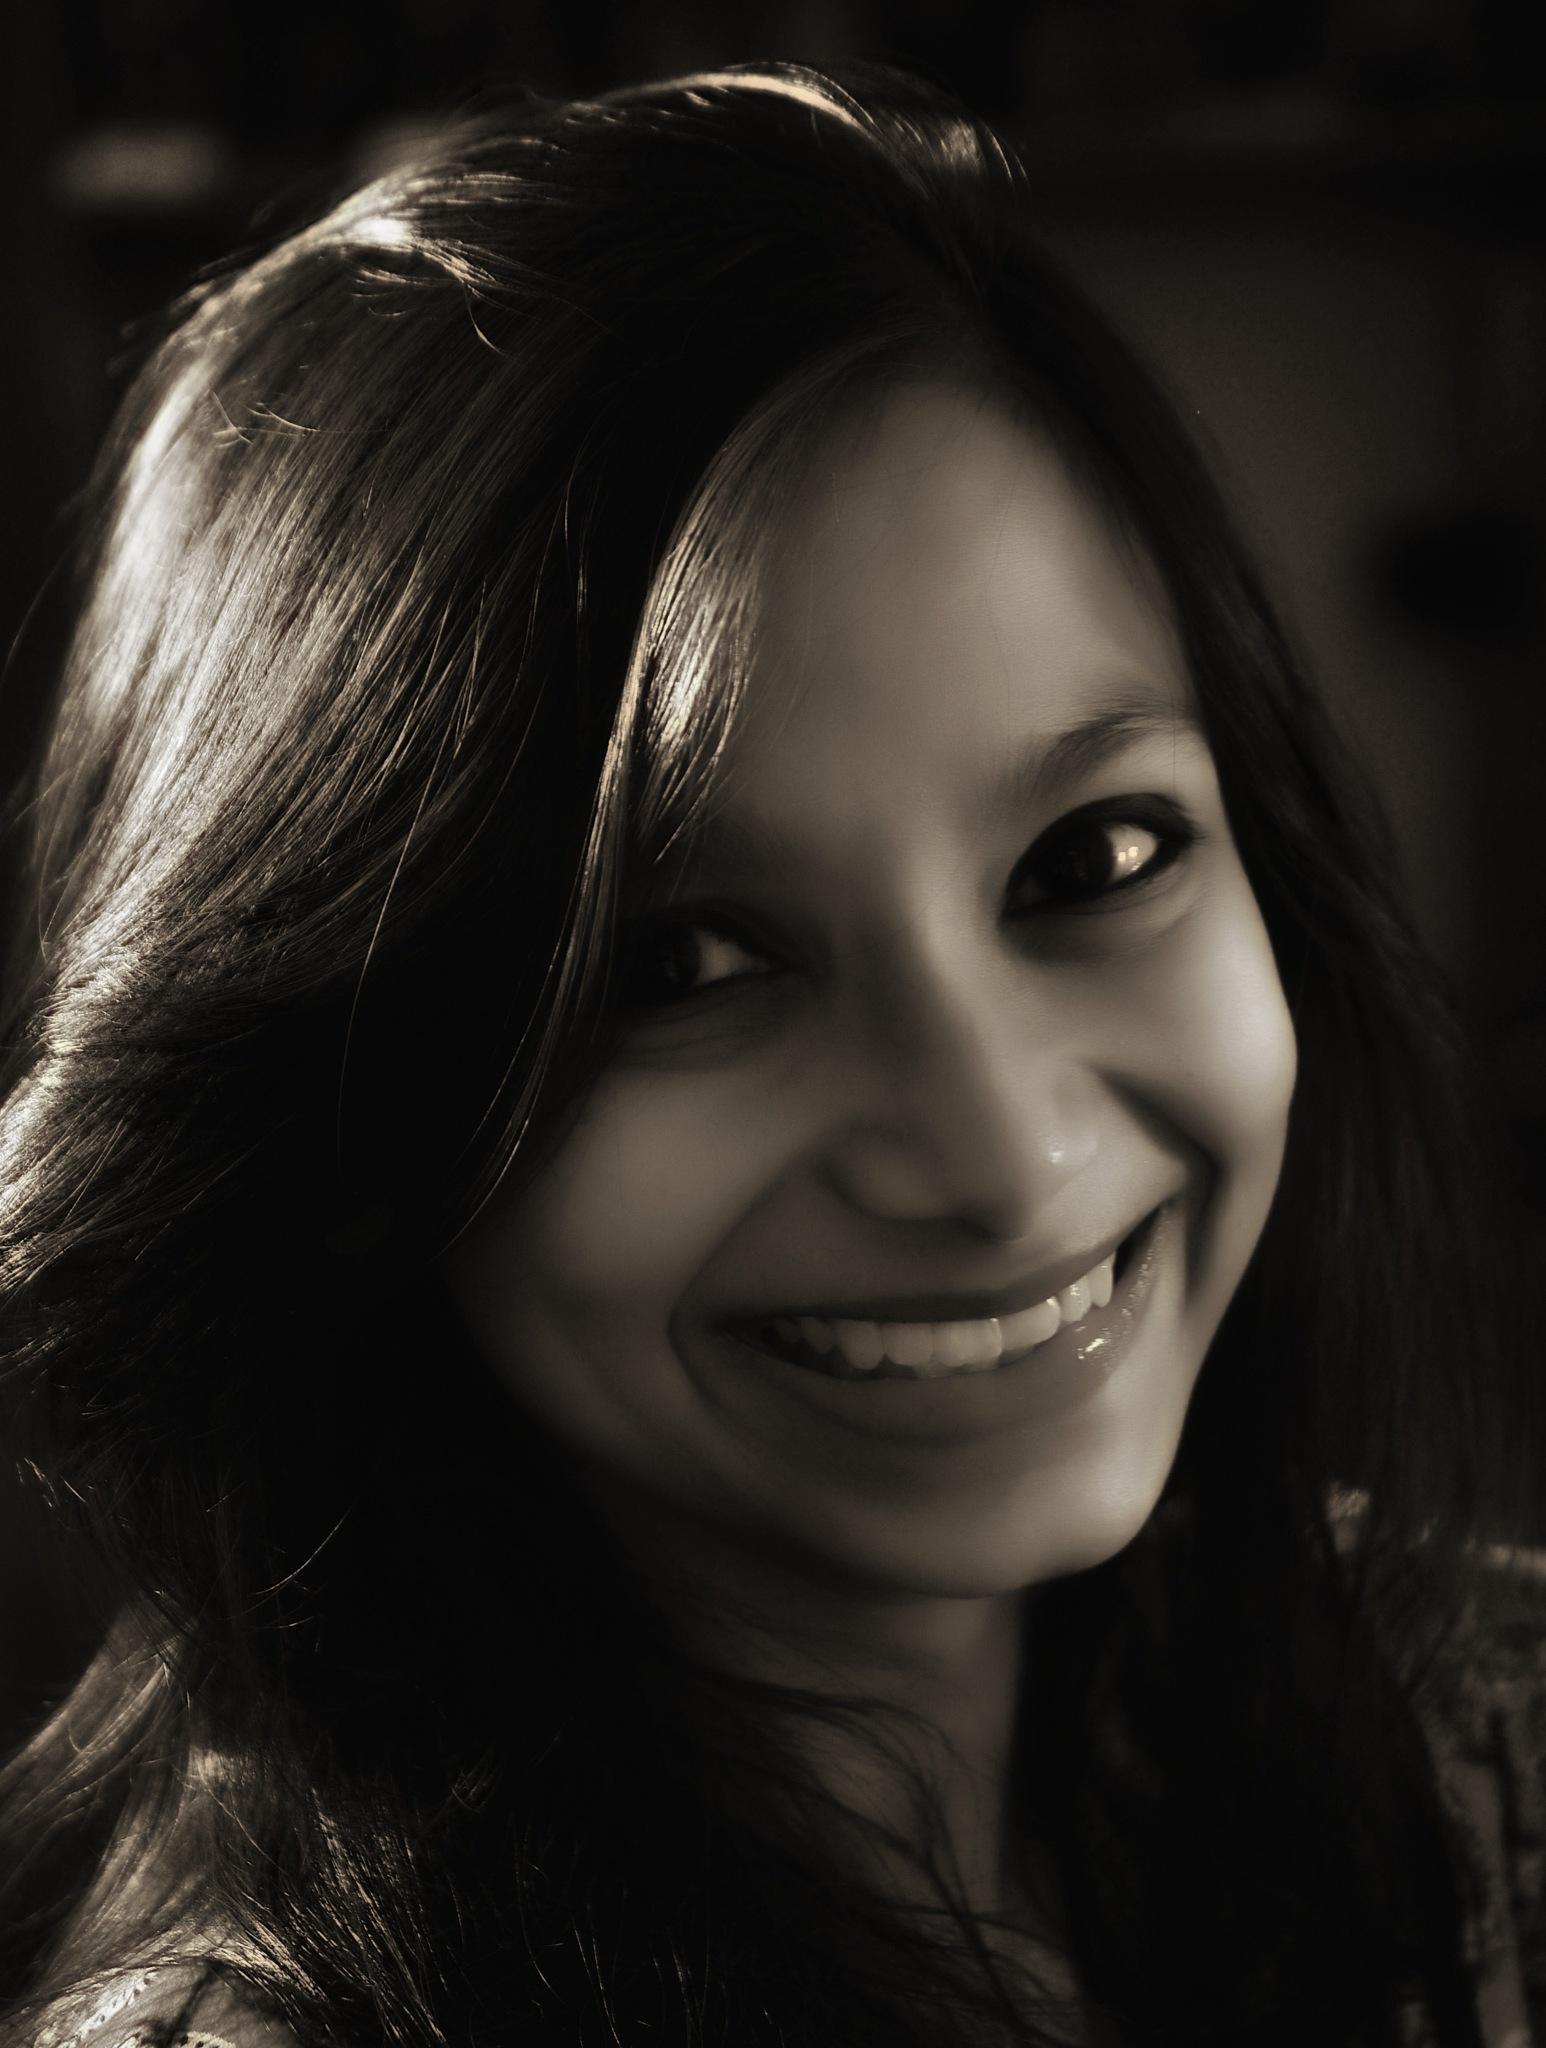 Portrait study in monochrome by abhrajitde